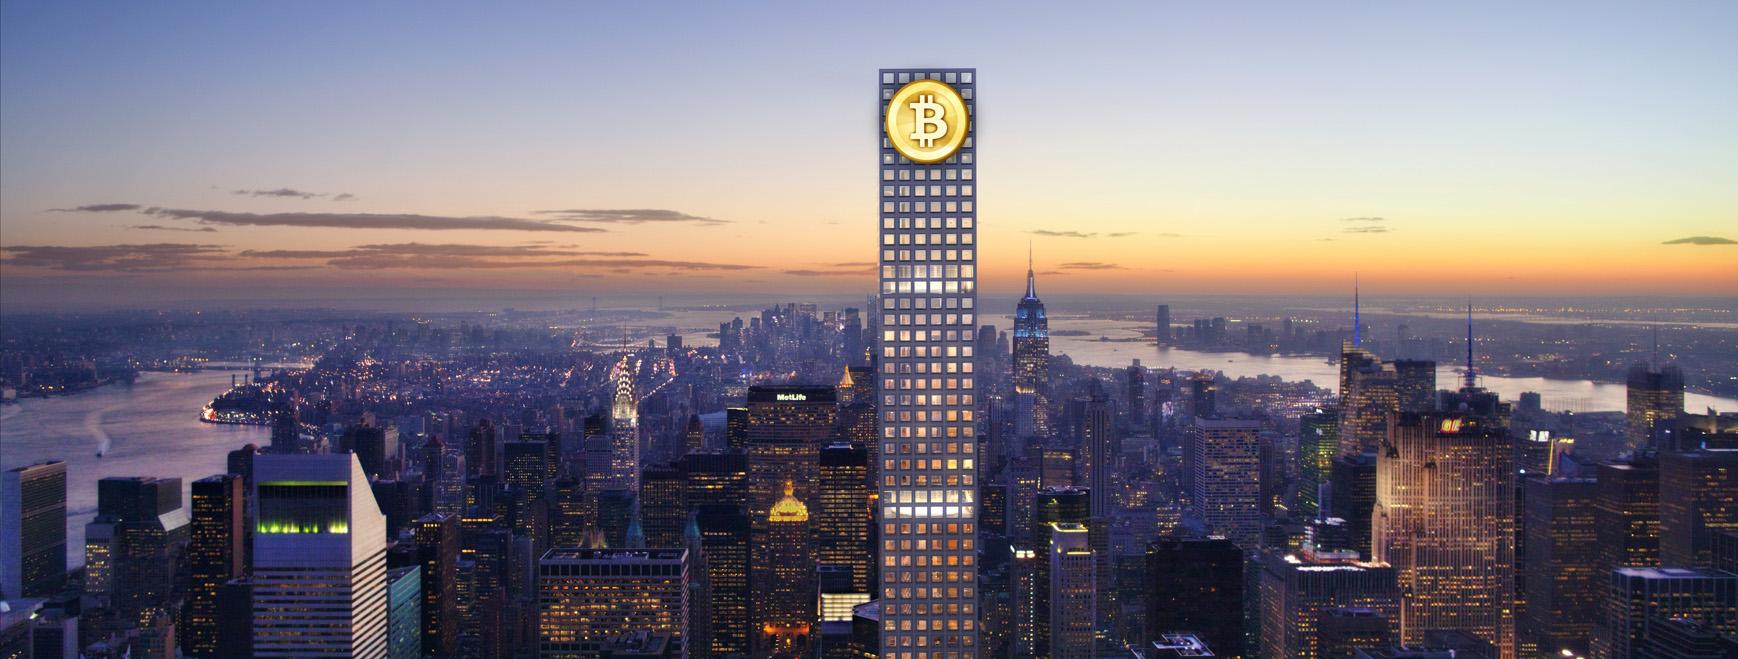 Bitcoin NYC.jpg